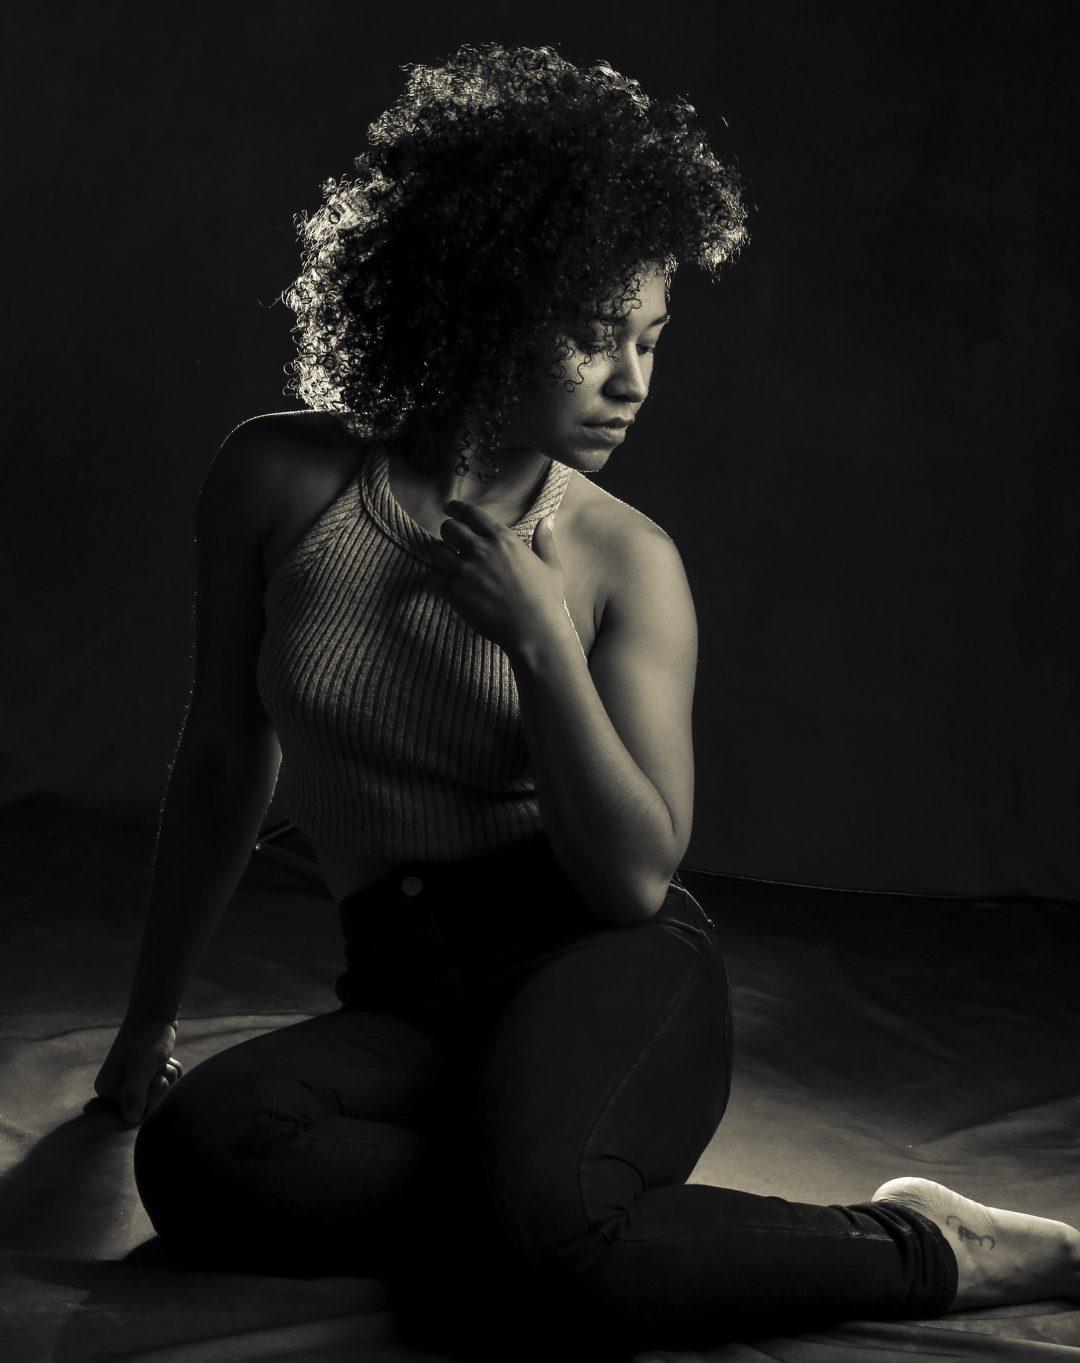 Virginia Beach Portrait Photographer   Candis Acting Headshots…